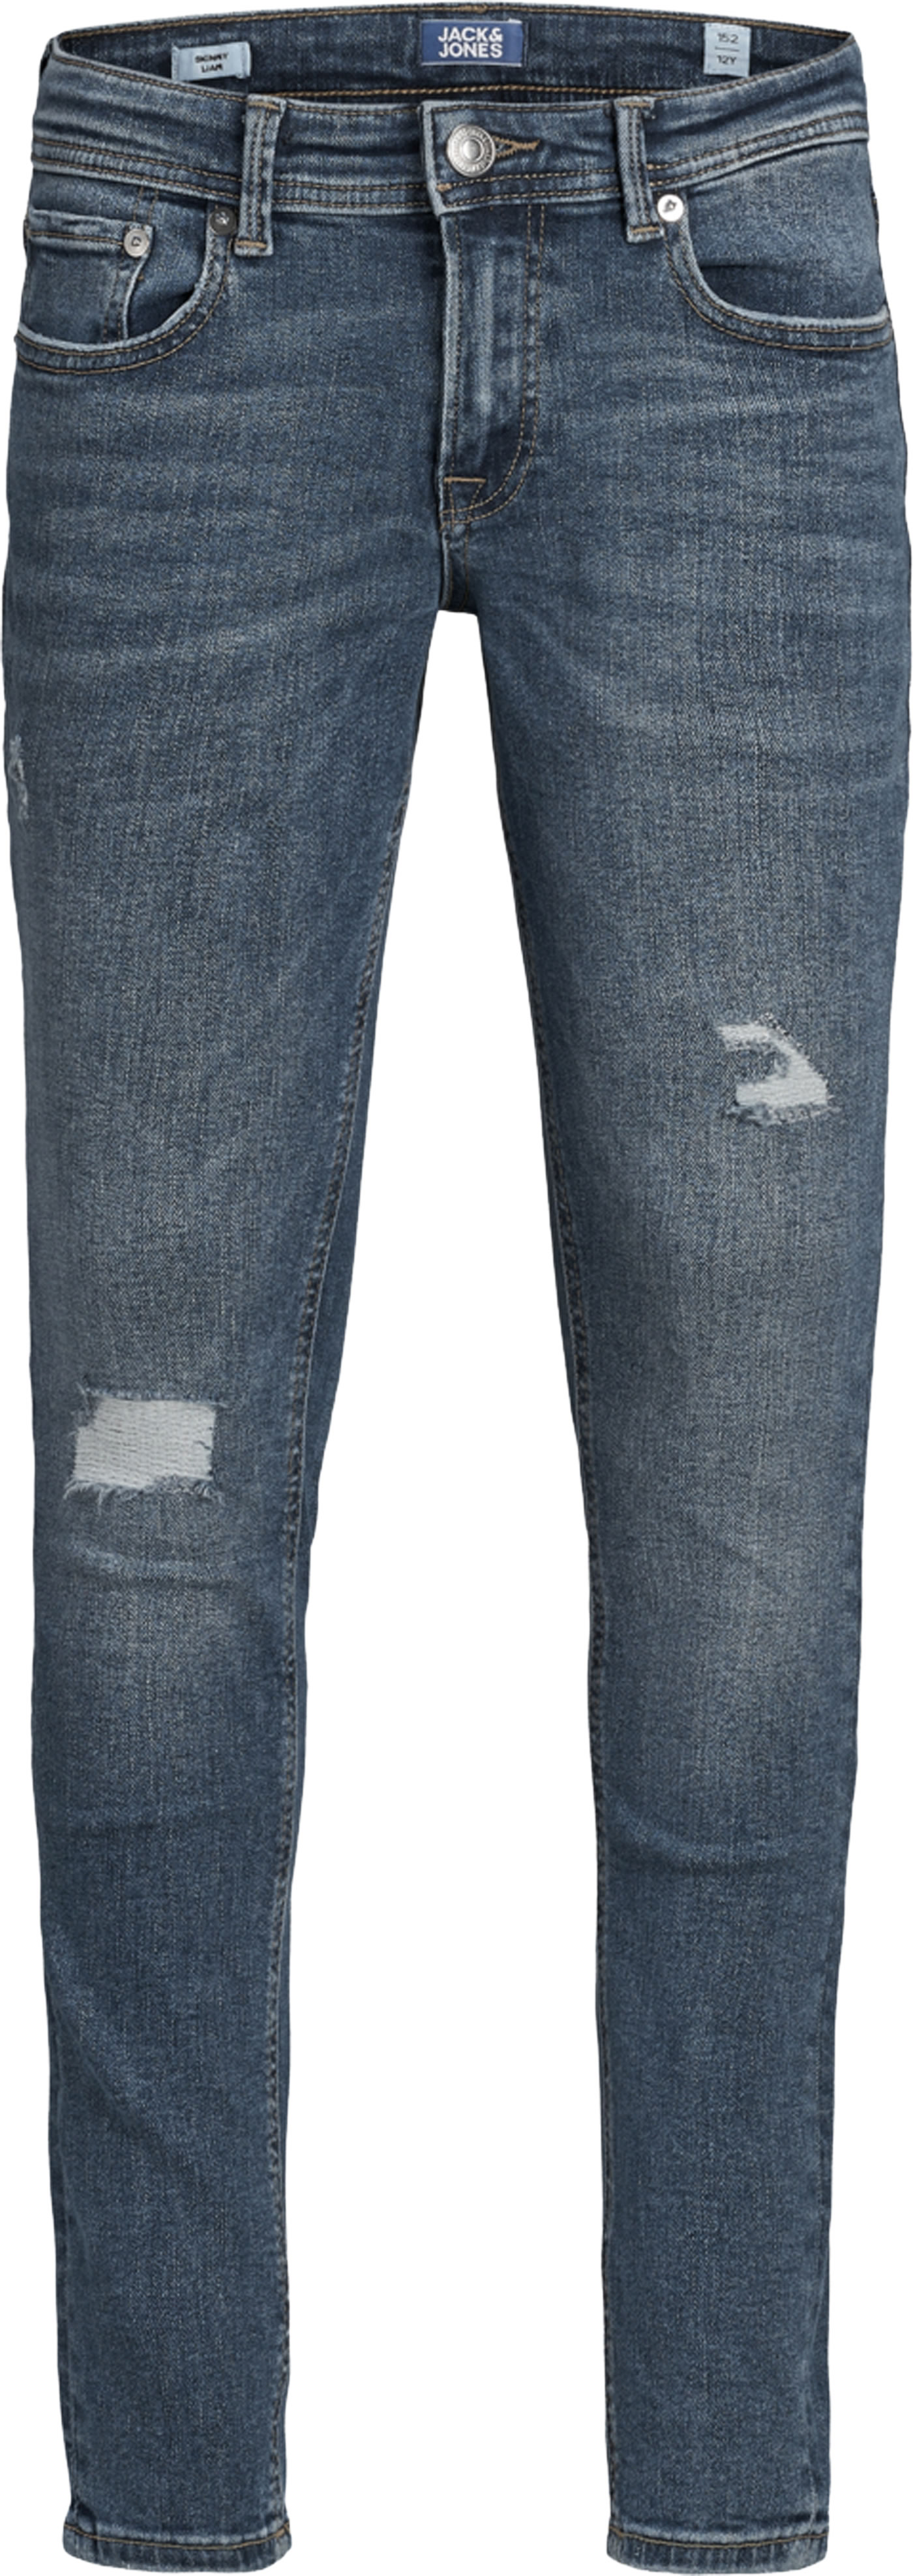 Jack /& Jones Junior Liam OG Garçons Coupe Skinny Jeans en denim bleu-clearance